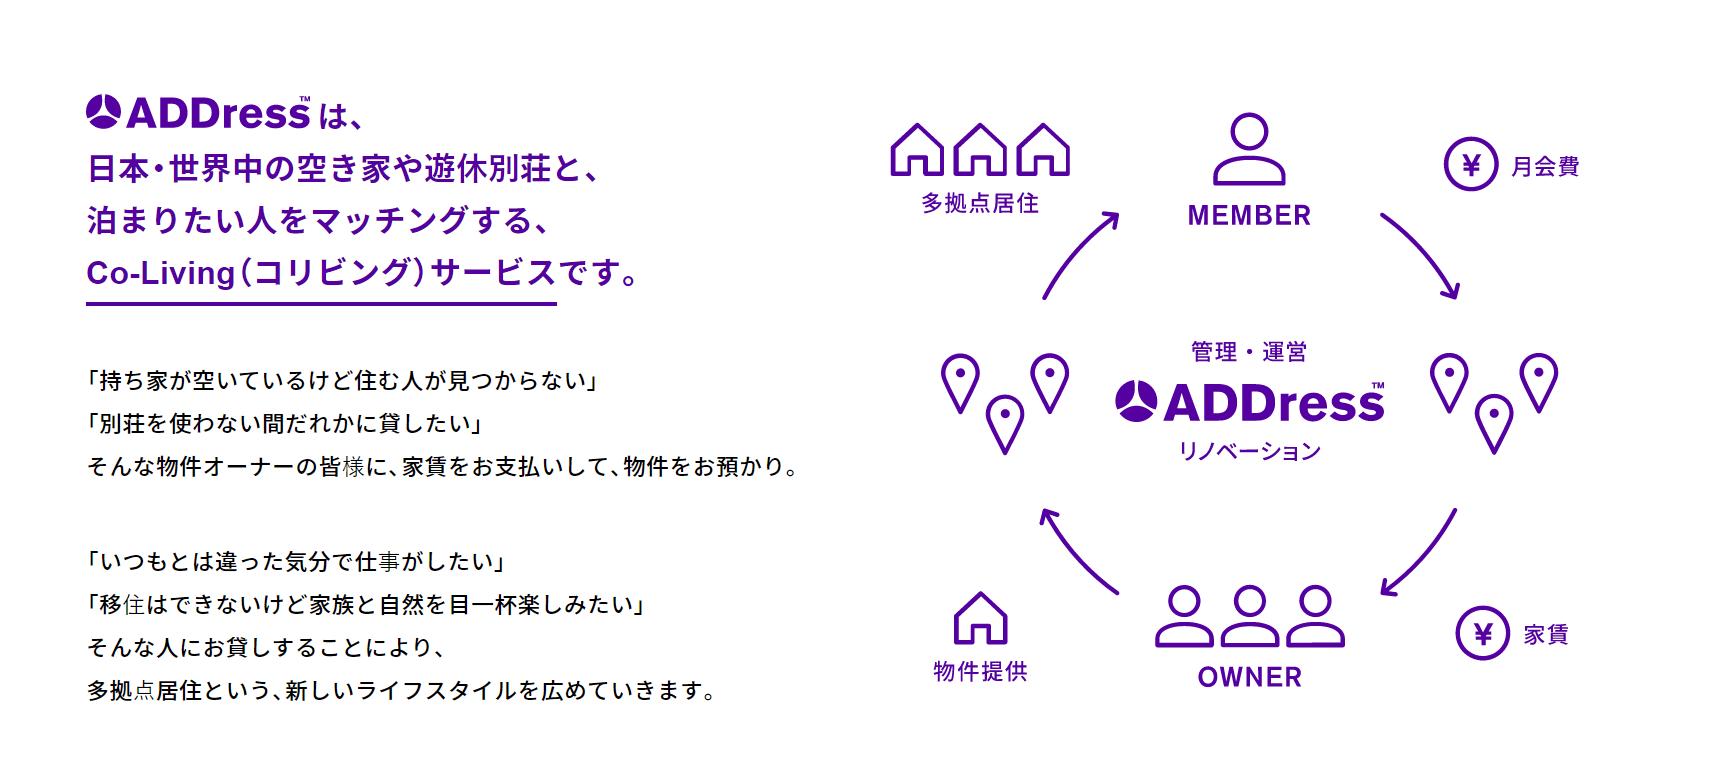 ADDressの提供するコリビングサービスの仕組み(アドレス提供)